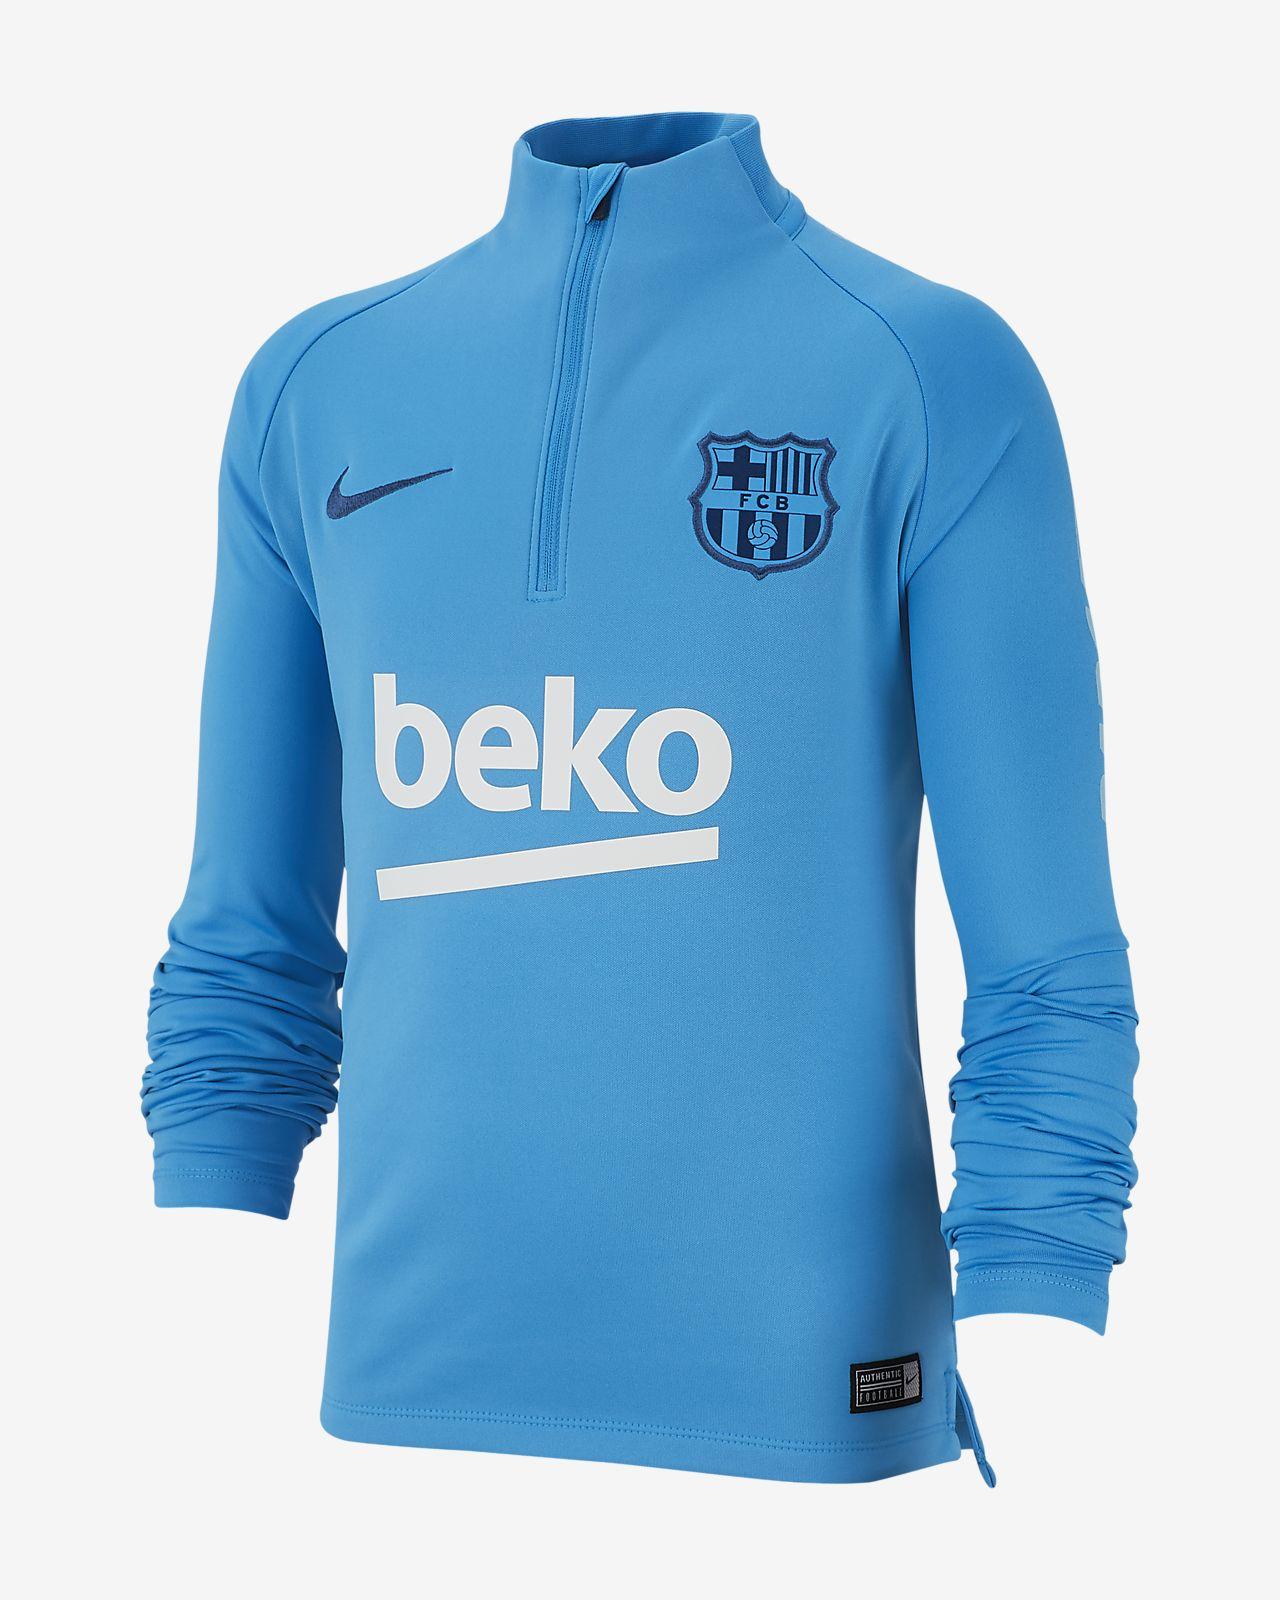 5762ea2ddf396 ... FC Barcelona Dri-FIT Squad Drill Camiseta de fútbol de manga larga -  Niño